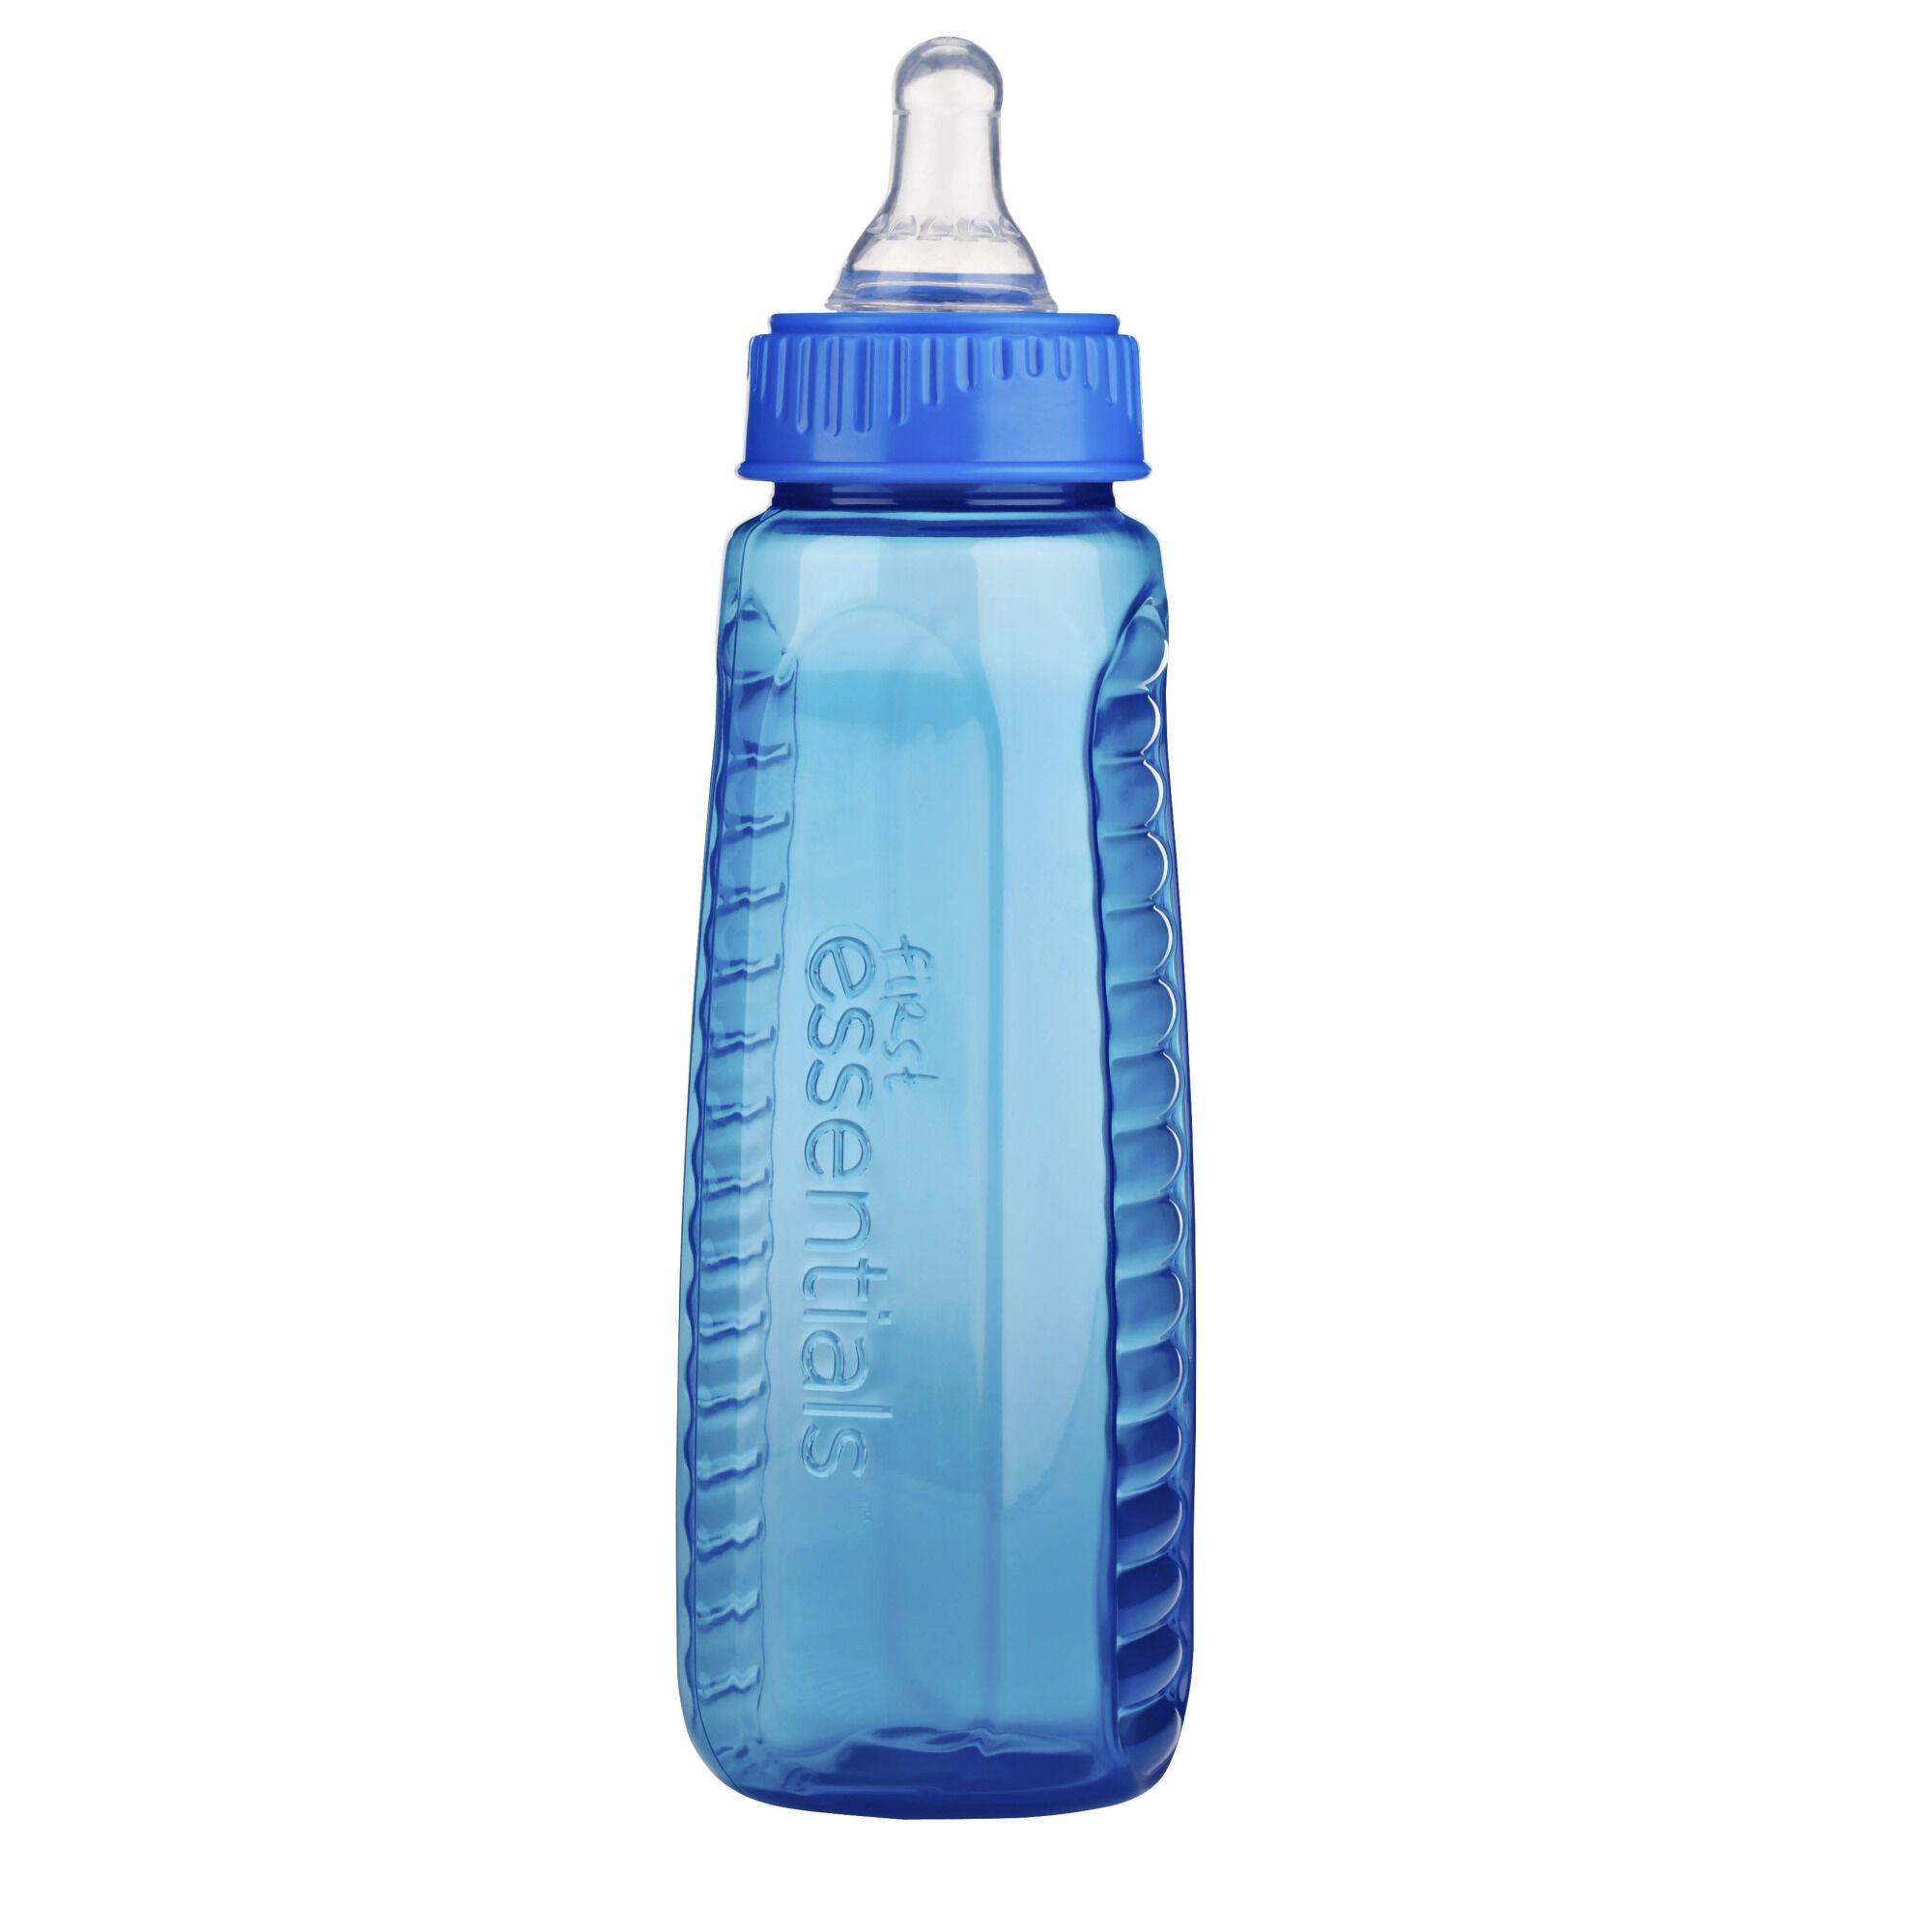 Gerber 174 Graduates 174 Fashion Tint Bottle Bottles Nuk